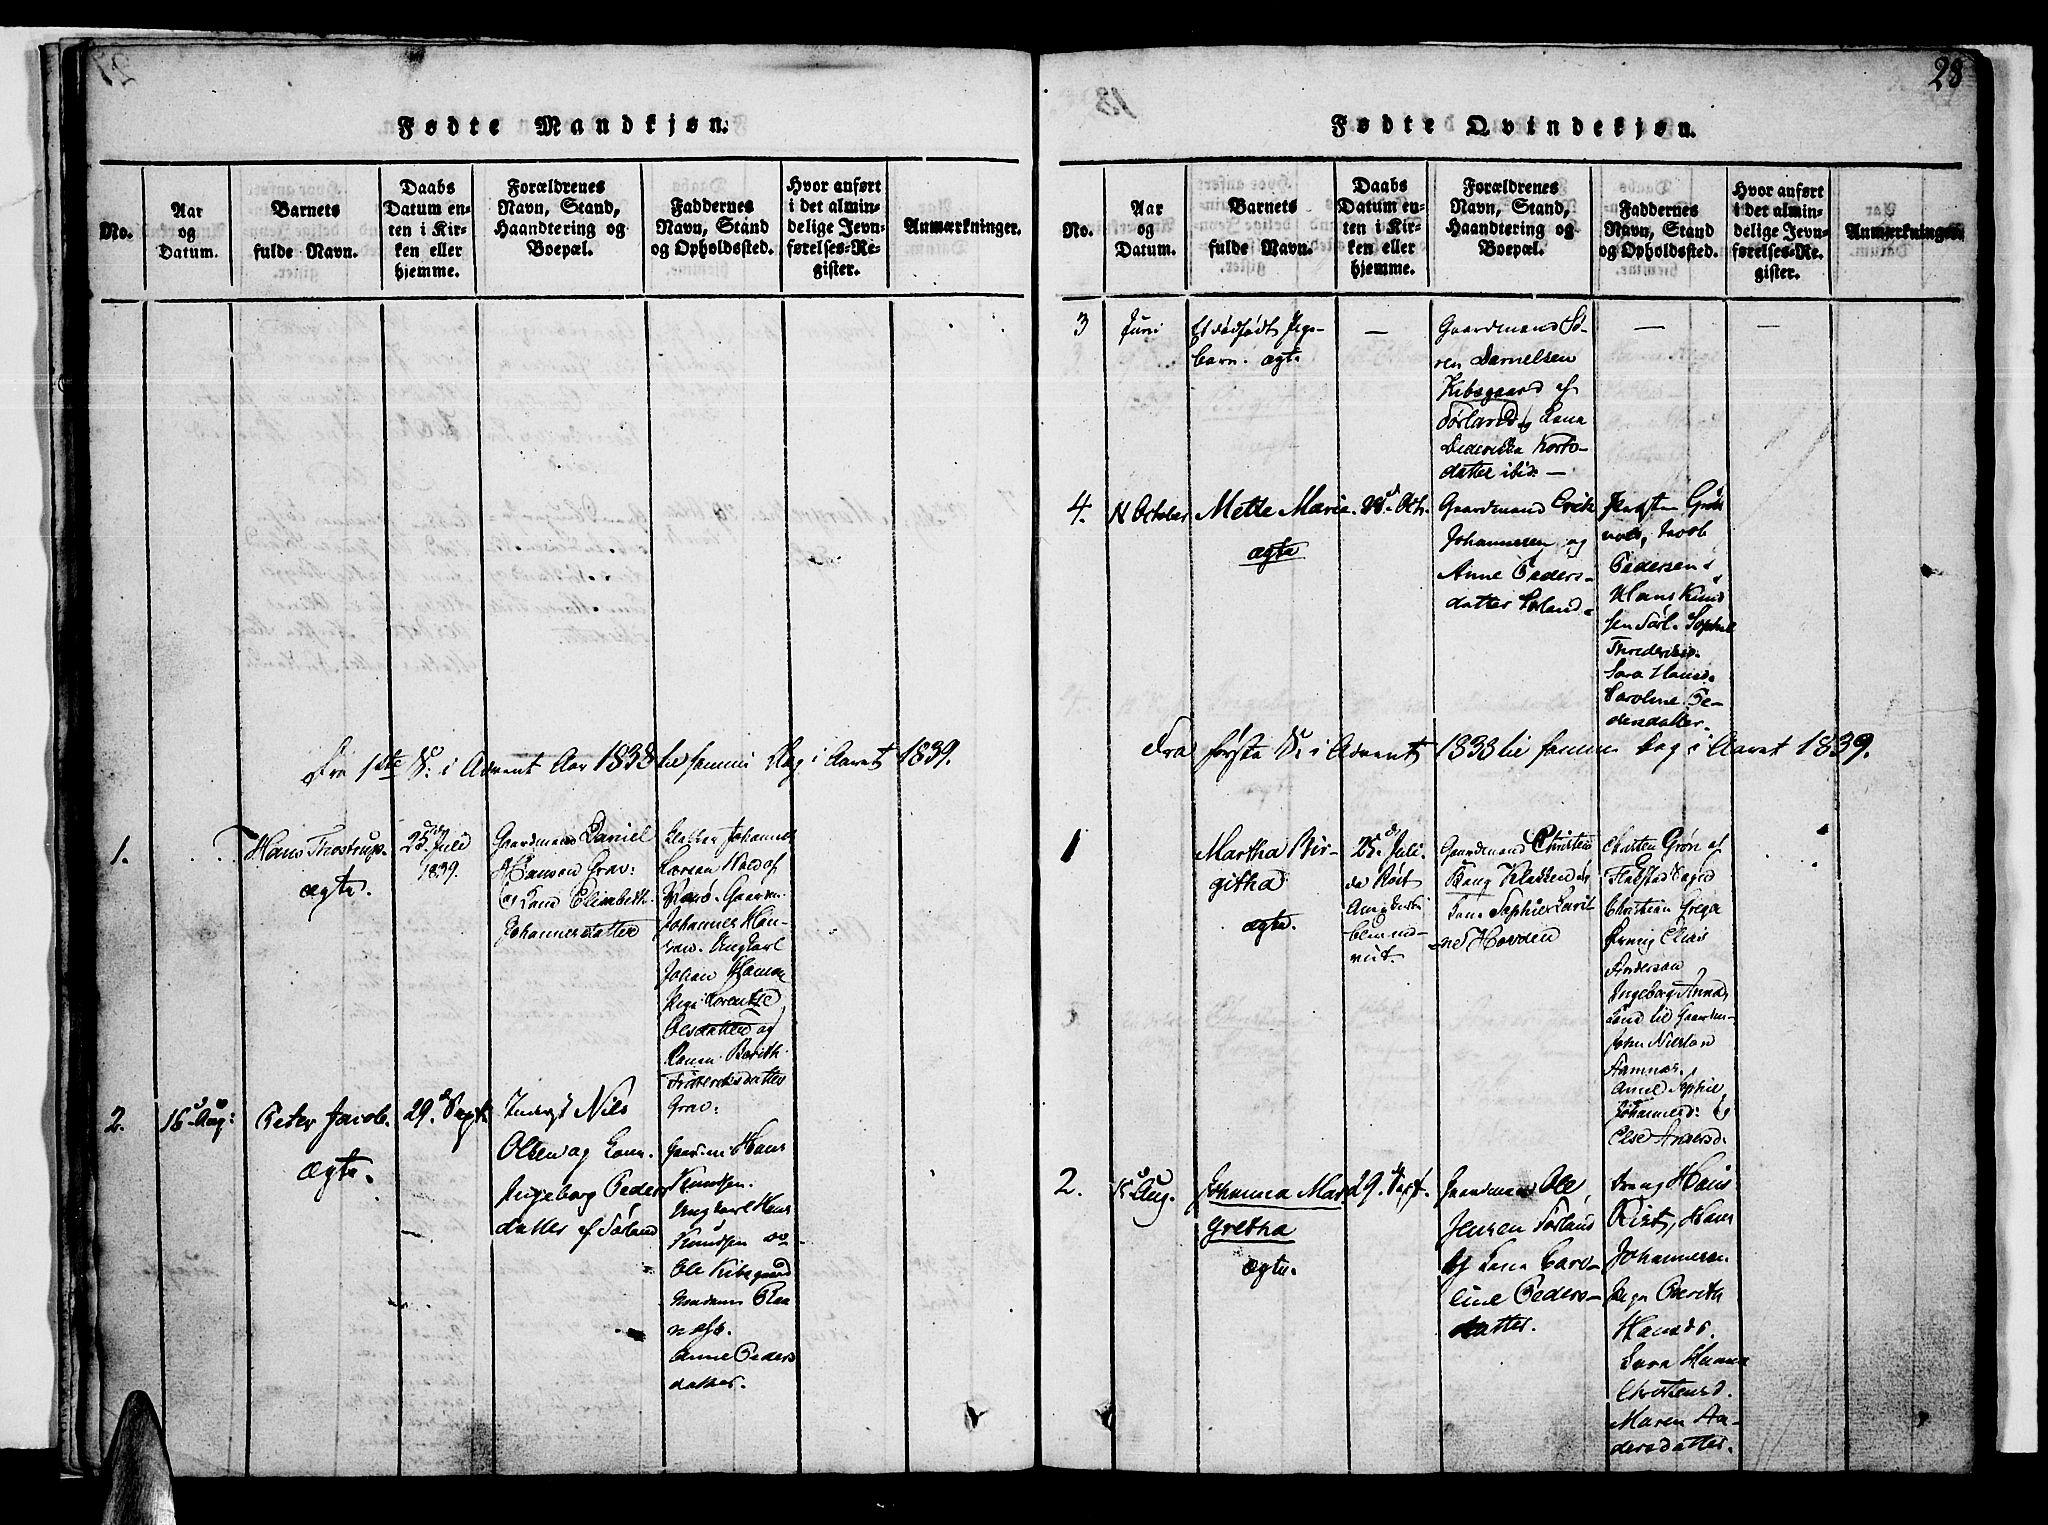 SAT, Ministerialprotokoller, klokkerbøker og fødselsregistre - Nordland, 807/L0120: Ministerialbok nr. 807A03, 1821-1848, s. 28